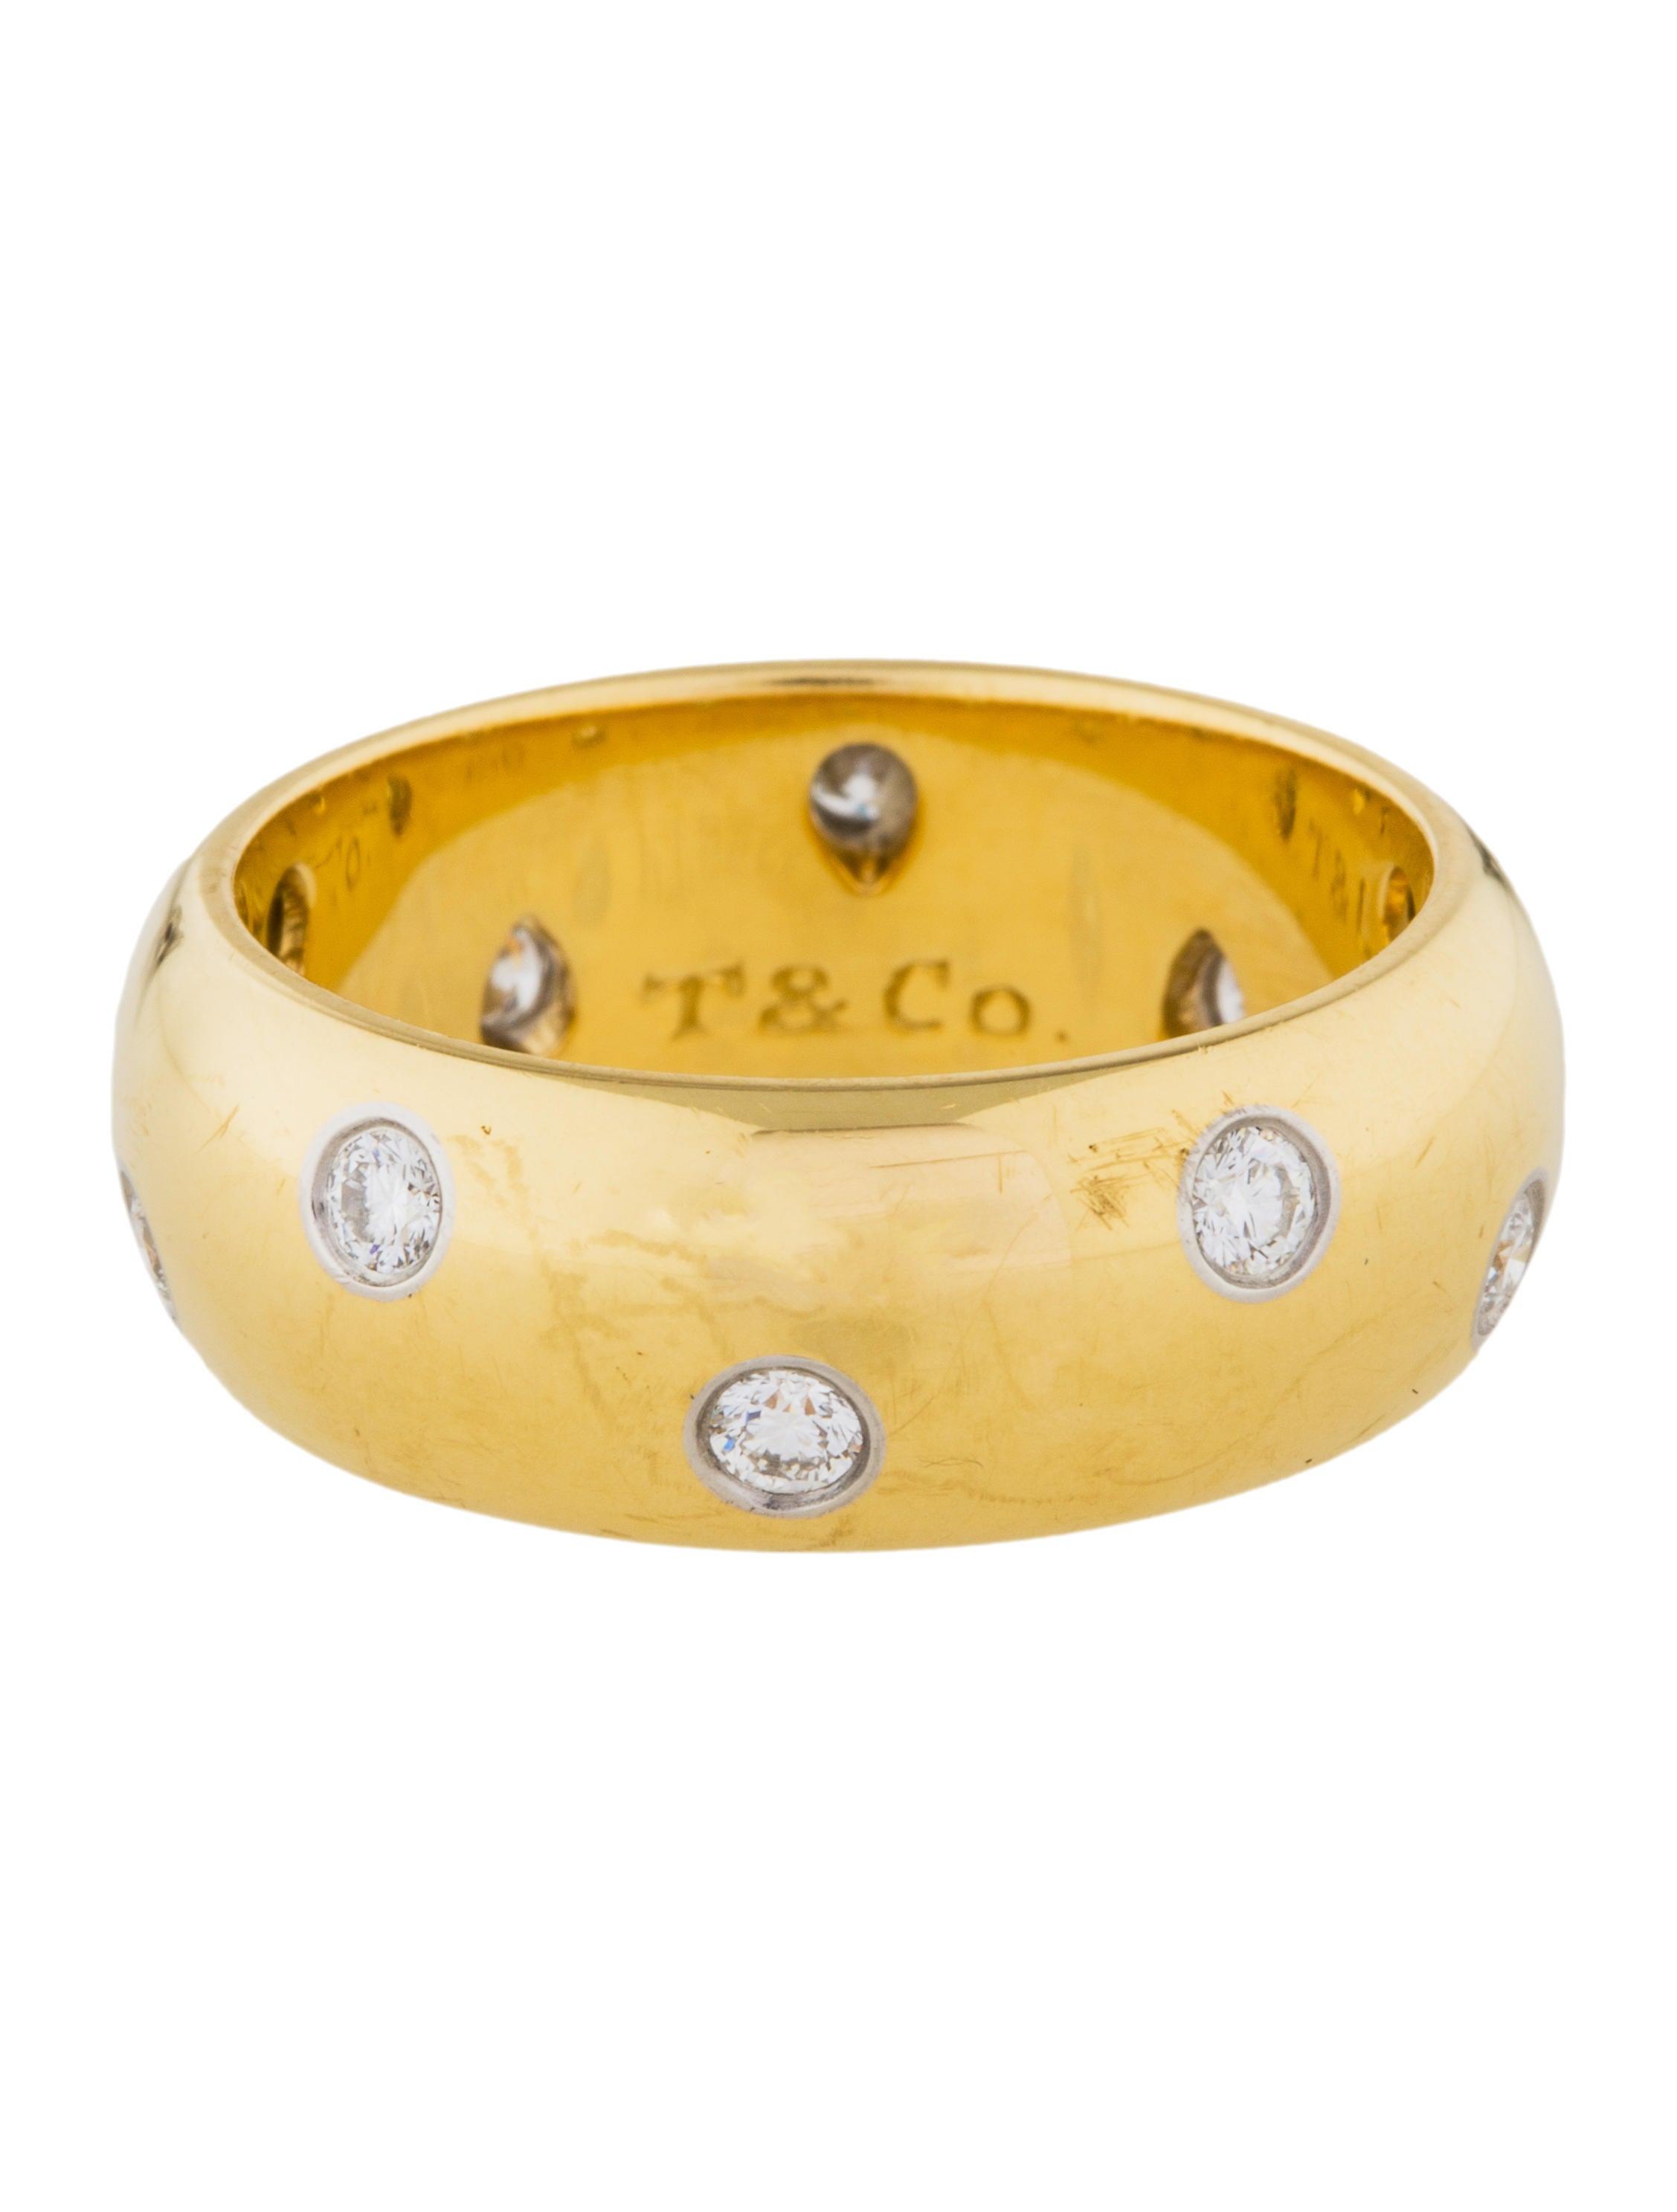 Tiffany Amp Co Etoile Band Rings Tif58355 The Realreal